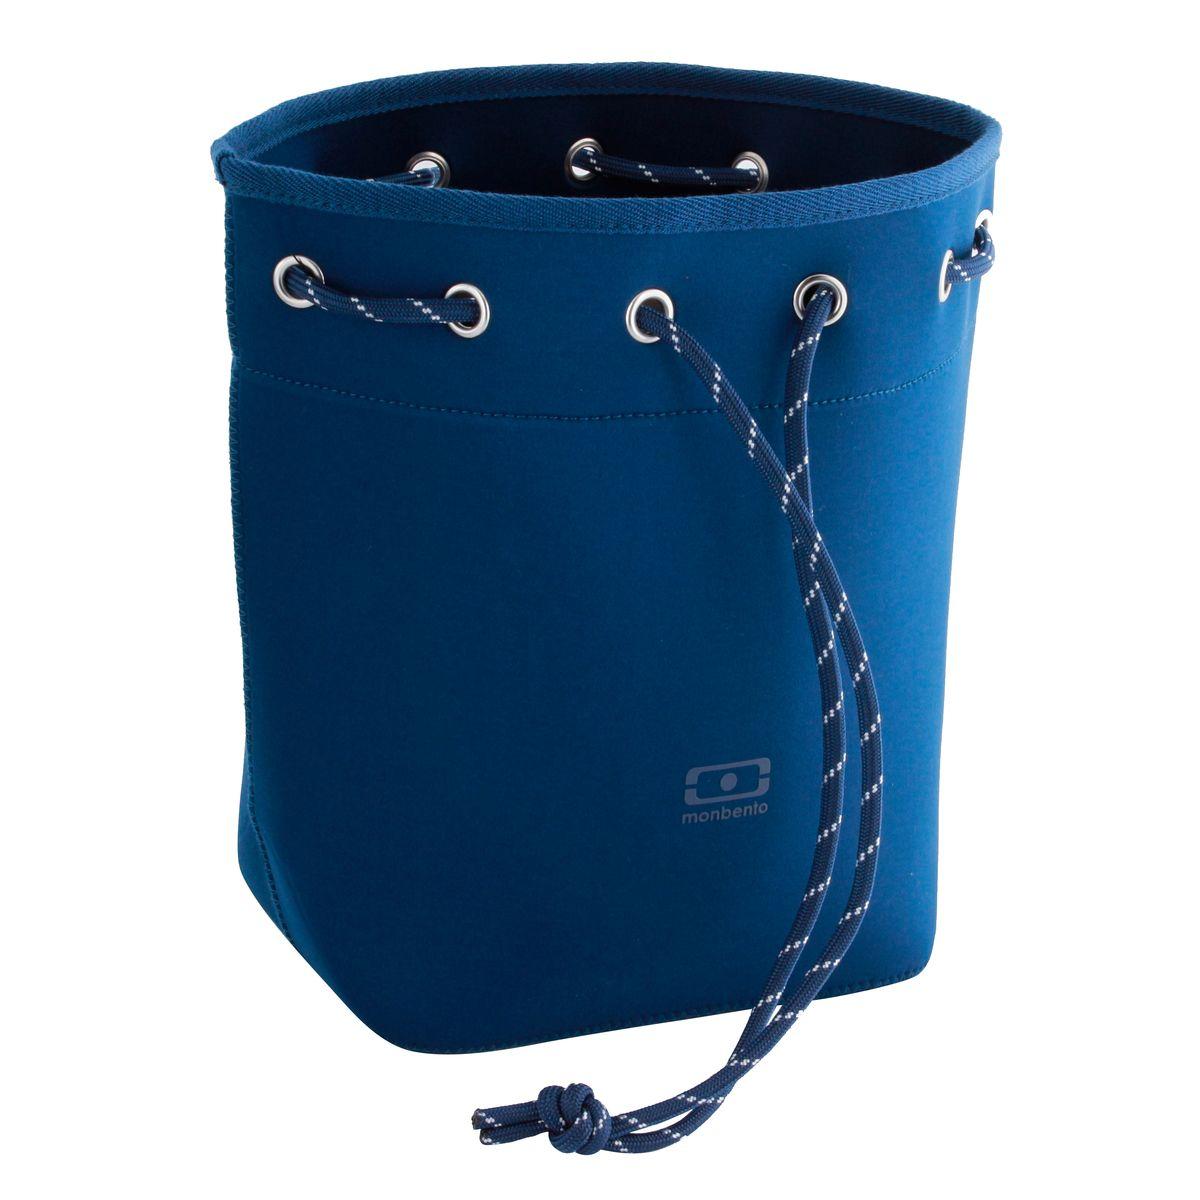 Sac isotherme bleu eZy - Monbento